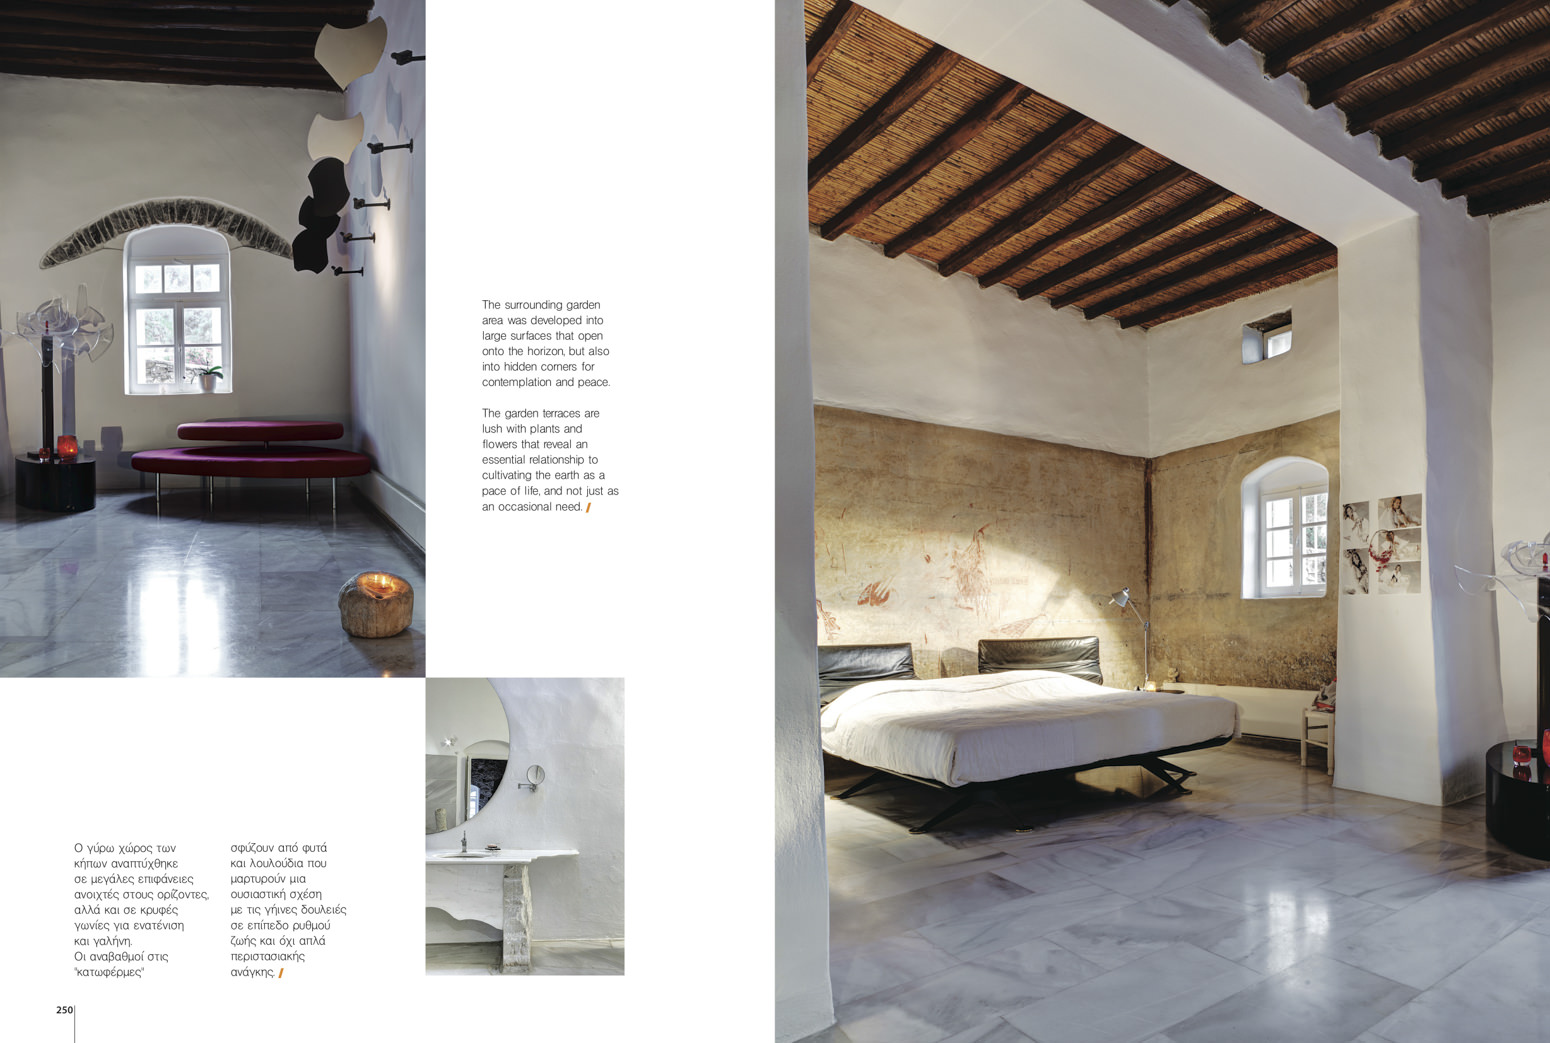 Maison de campagne 2014 magazine george fakaros - Maisons de campagne magazine ...